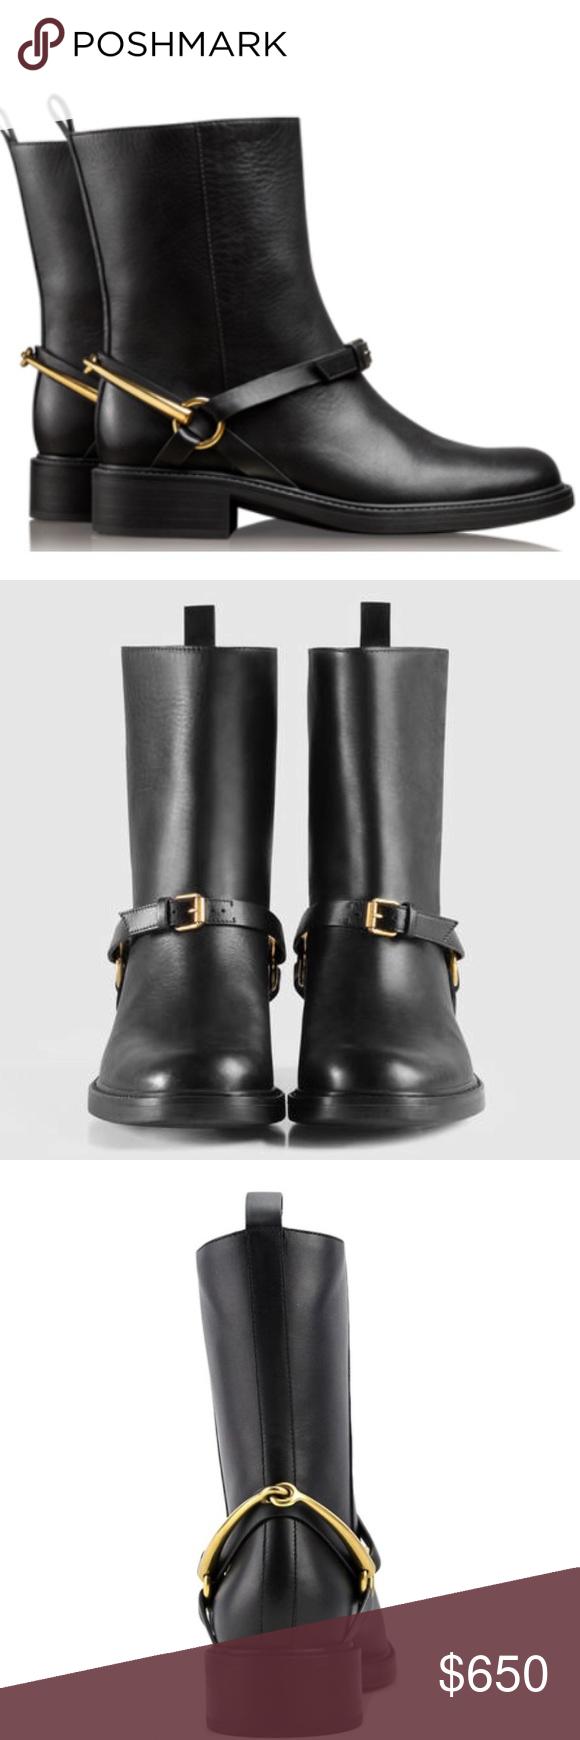 45c777106 •Gucci• Tess Black Leather Horsebit Ankle Boots Gucci Tess Black Leather  Horsebit Ankle Boots